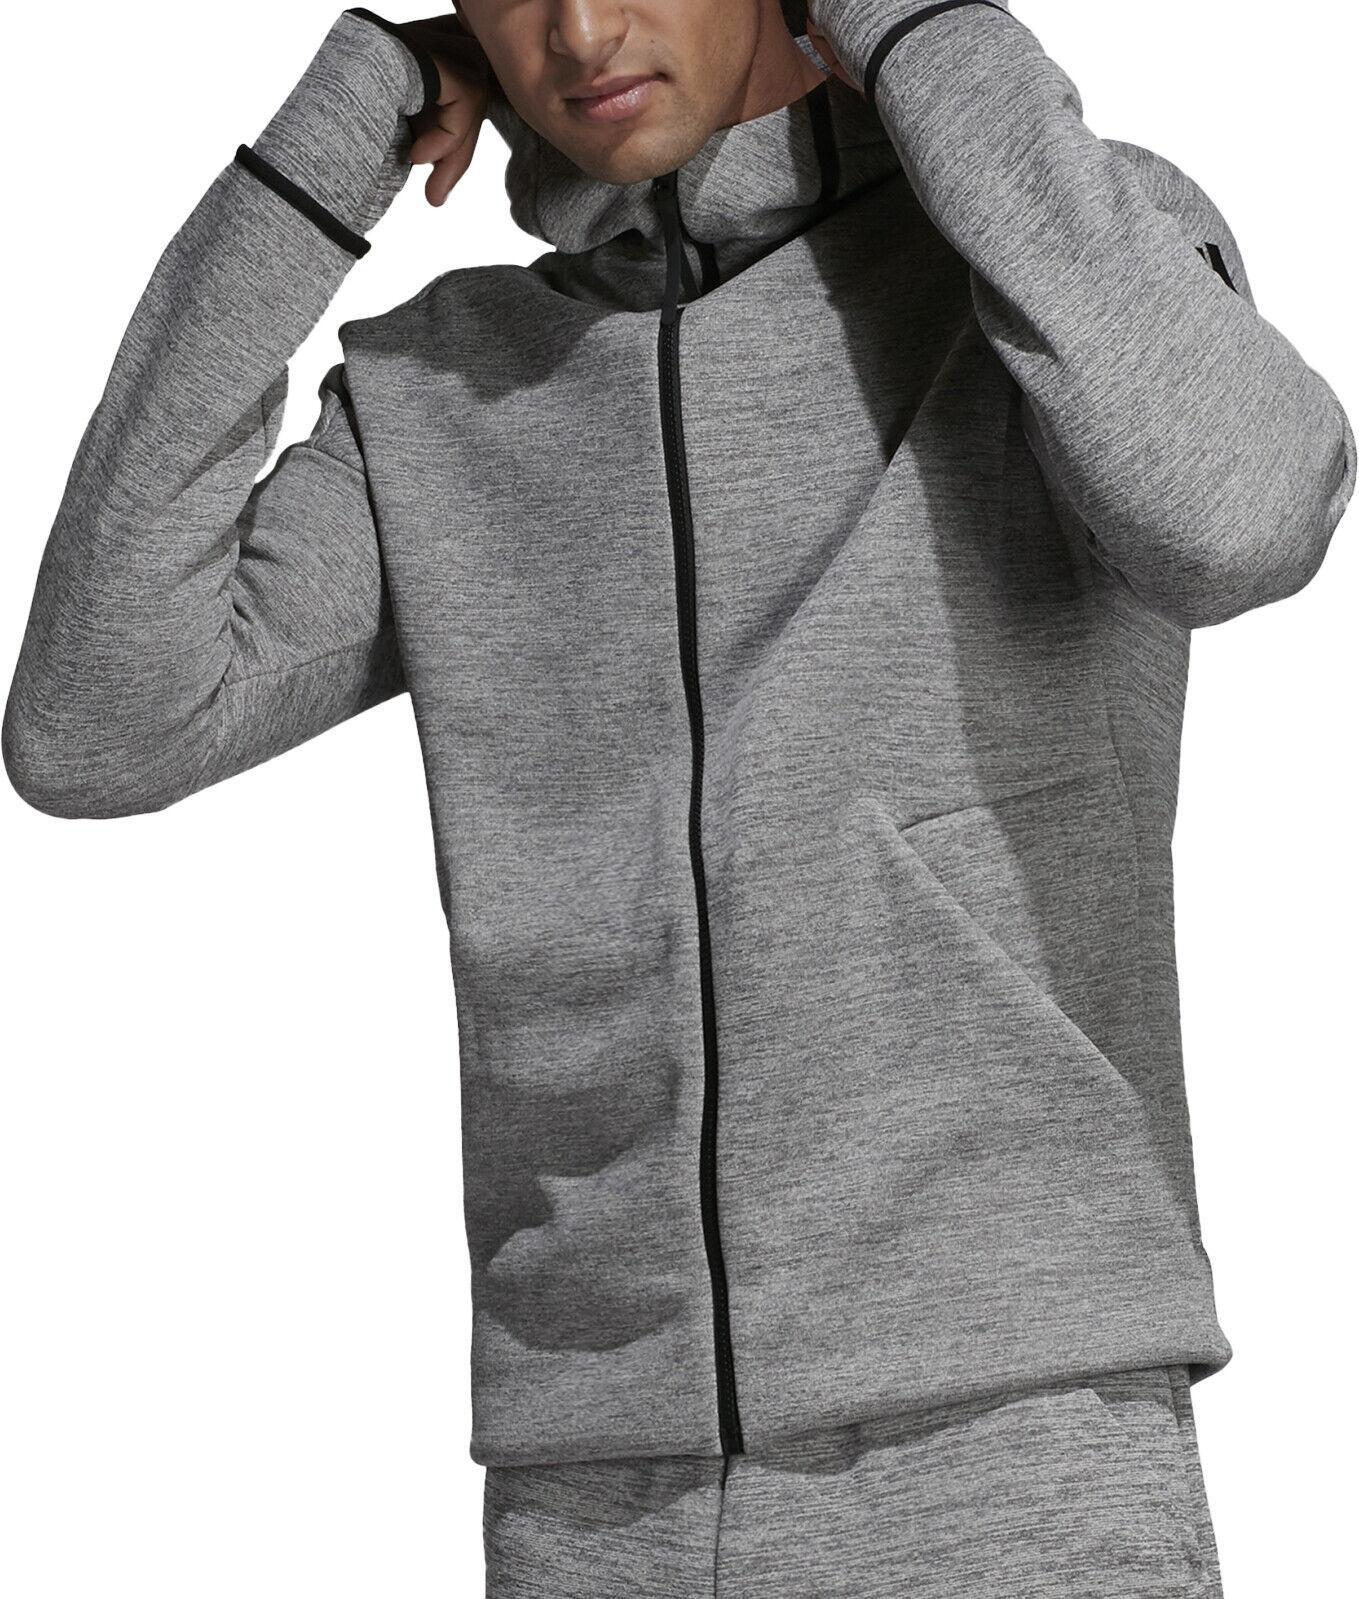 Adidas Z.N.E Fast Release Mens Hoody - grau  | Offizielle Webseite